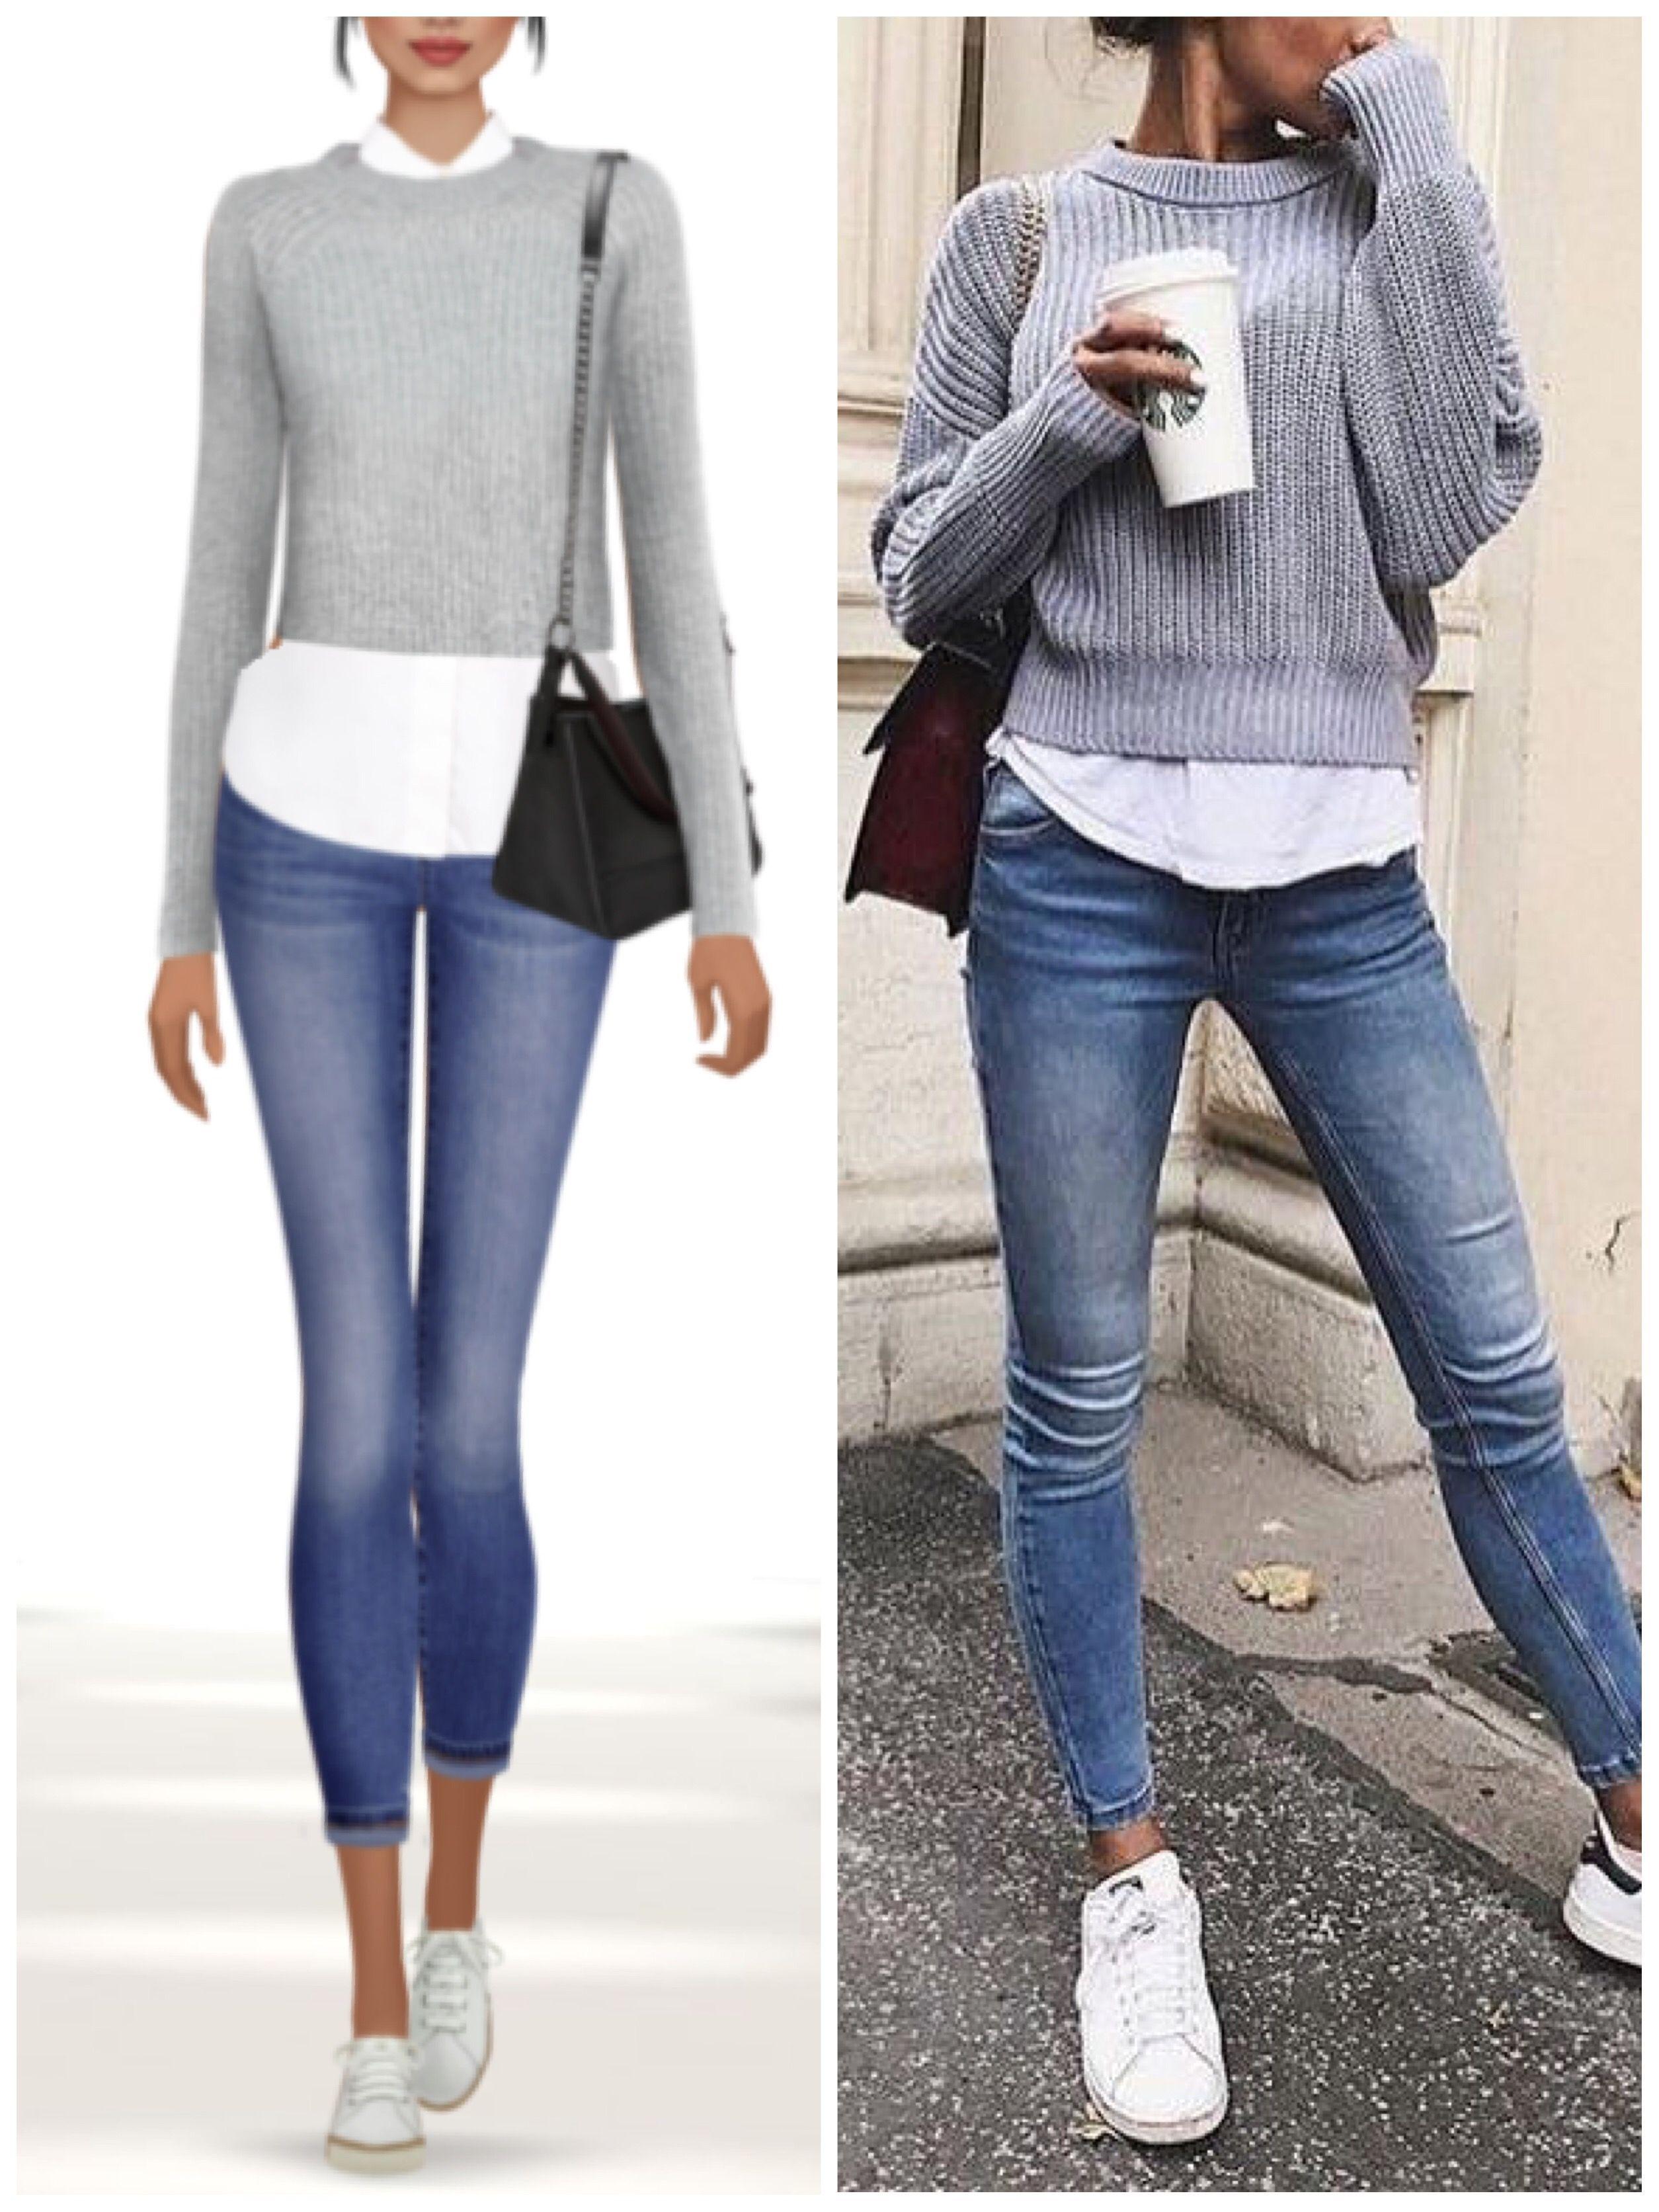 Moda in ufficio: Autunno 45+ outfits #fashion #outfit #fall #moda